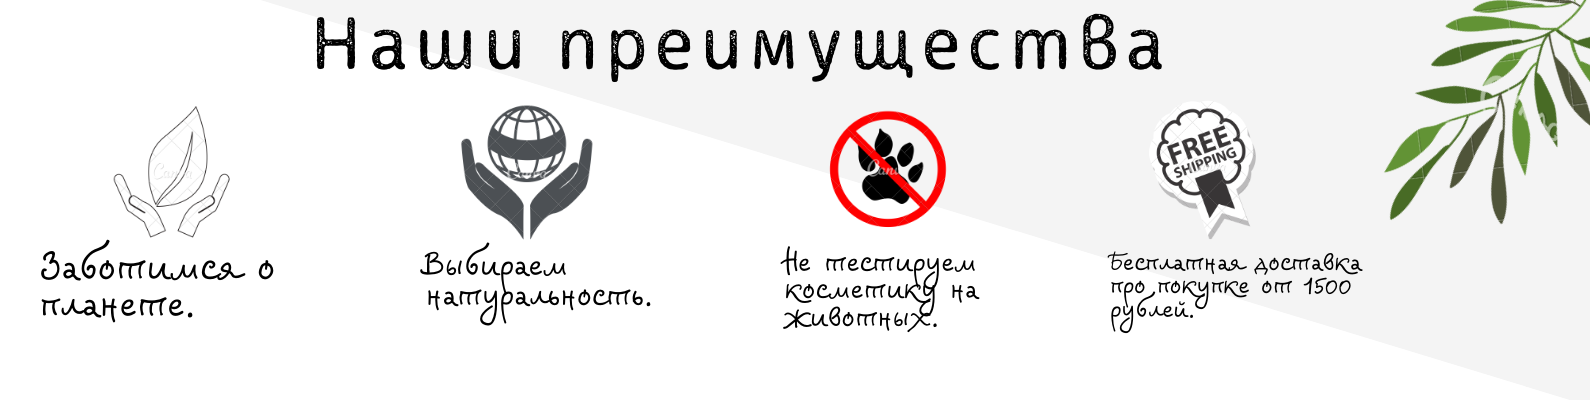 Картинка с текстом 2